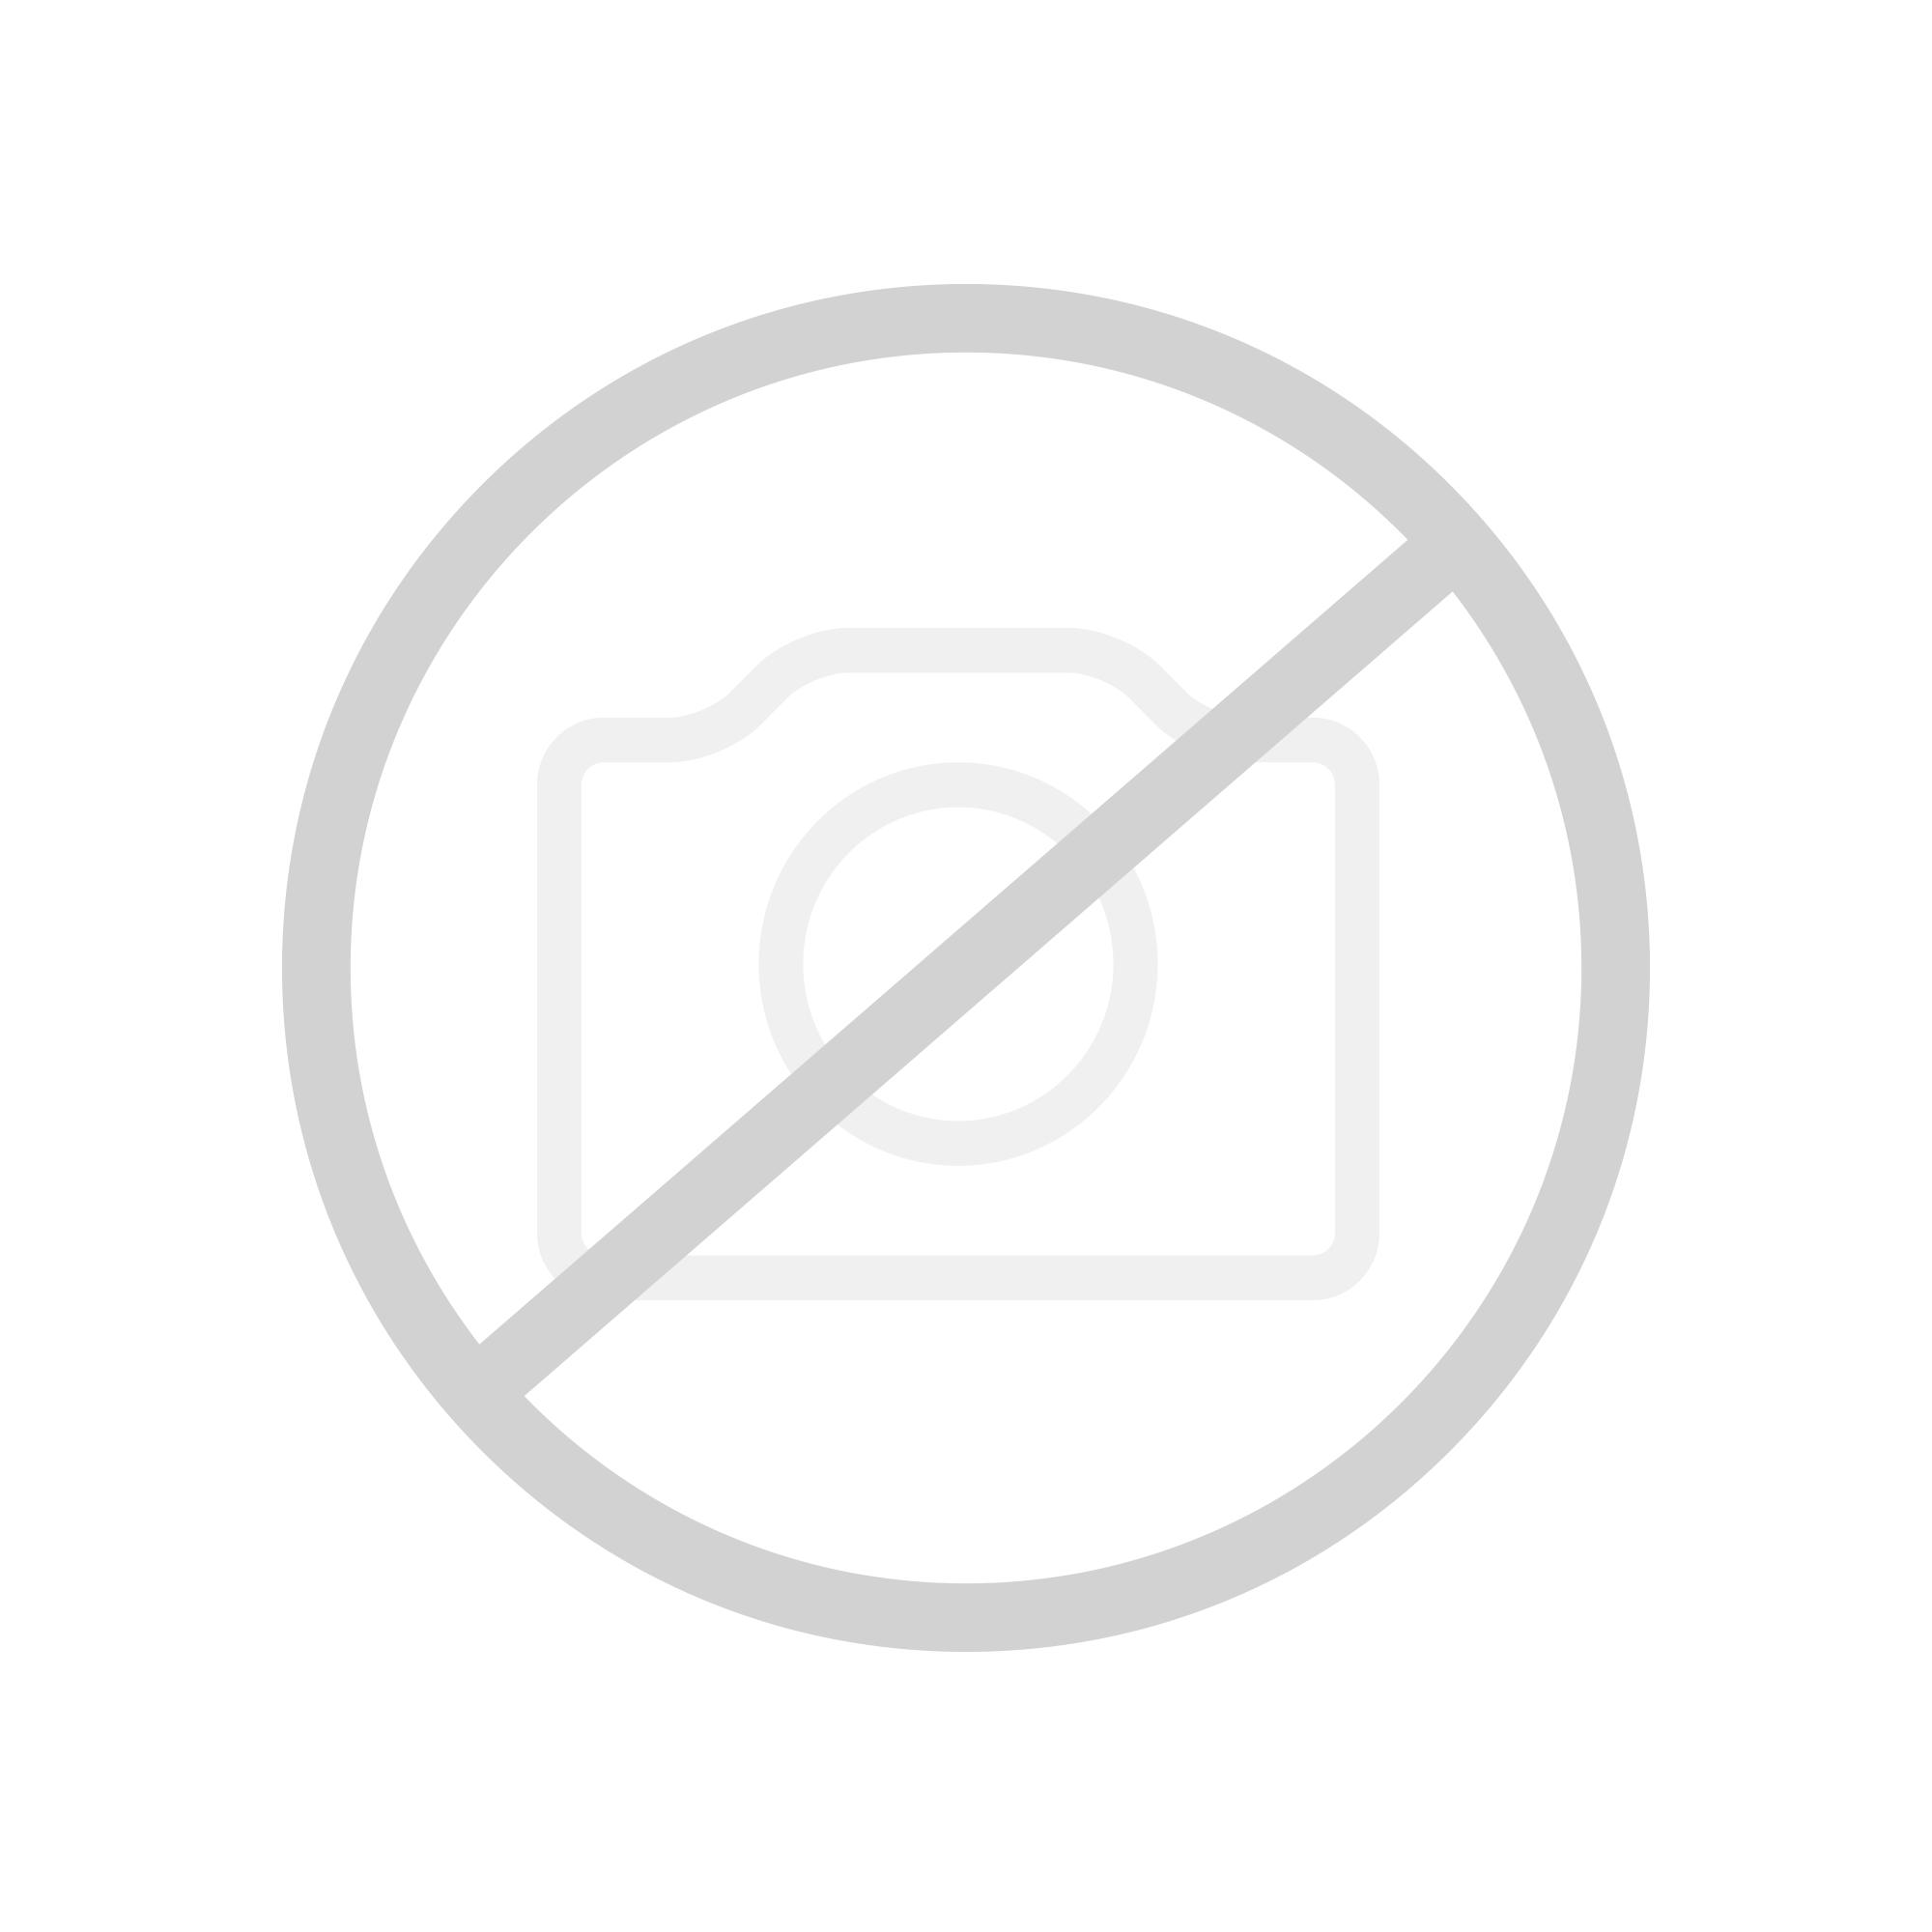 geberit duofix st tz und haltegriff 112 cm bf 111790001 reuter. Black Bedroom Furniture Sets. Home Design Ideas